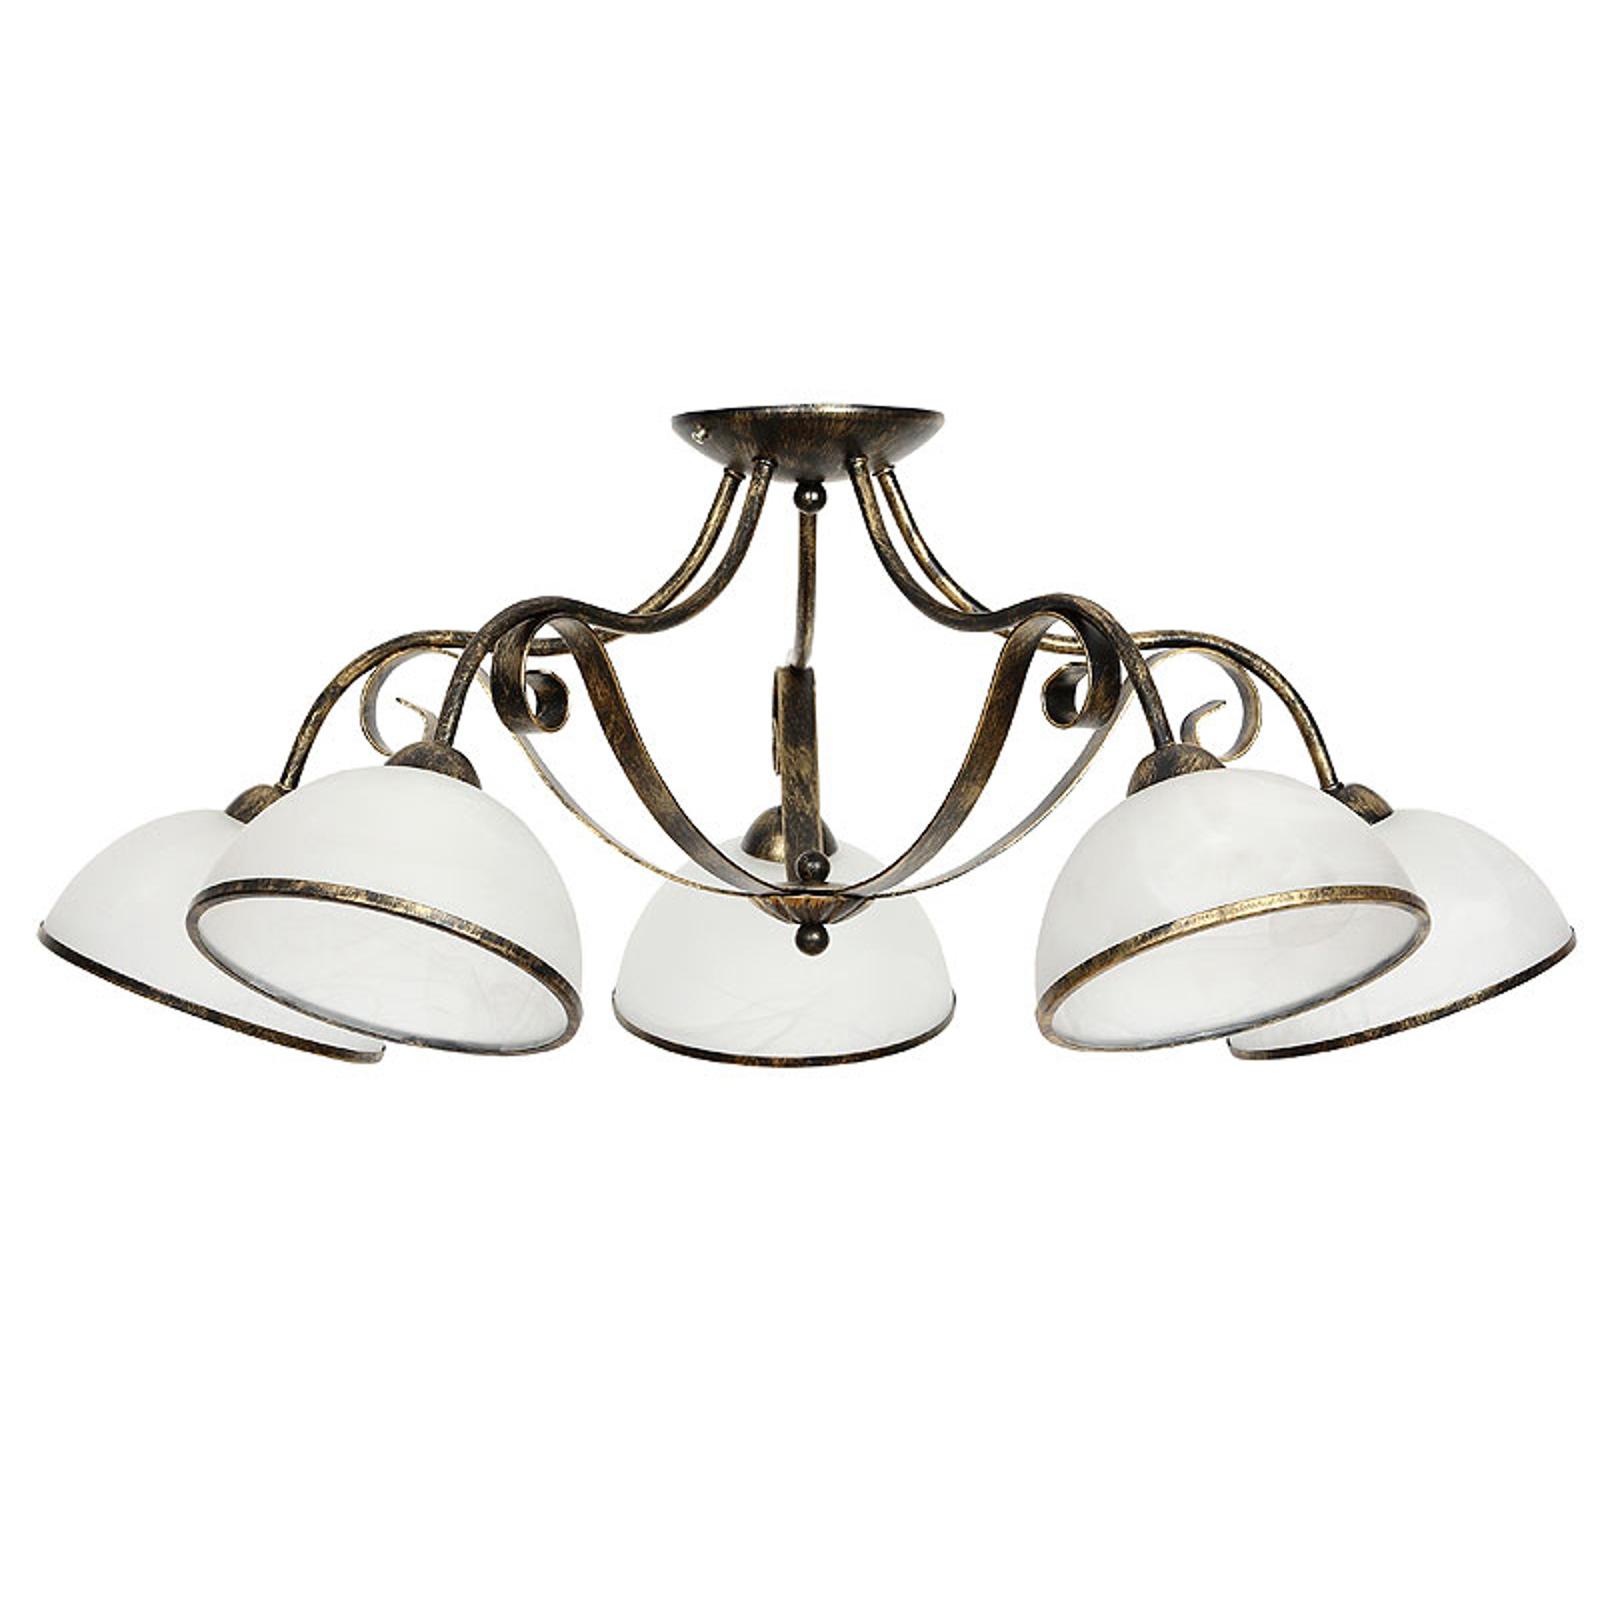 Taklampa Antica i lanthusstil, 5 lampor